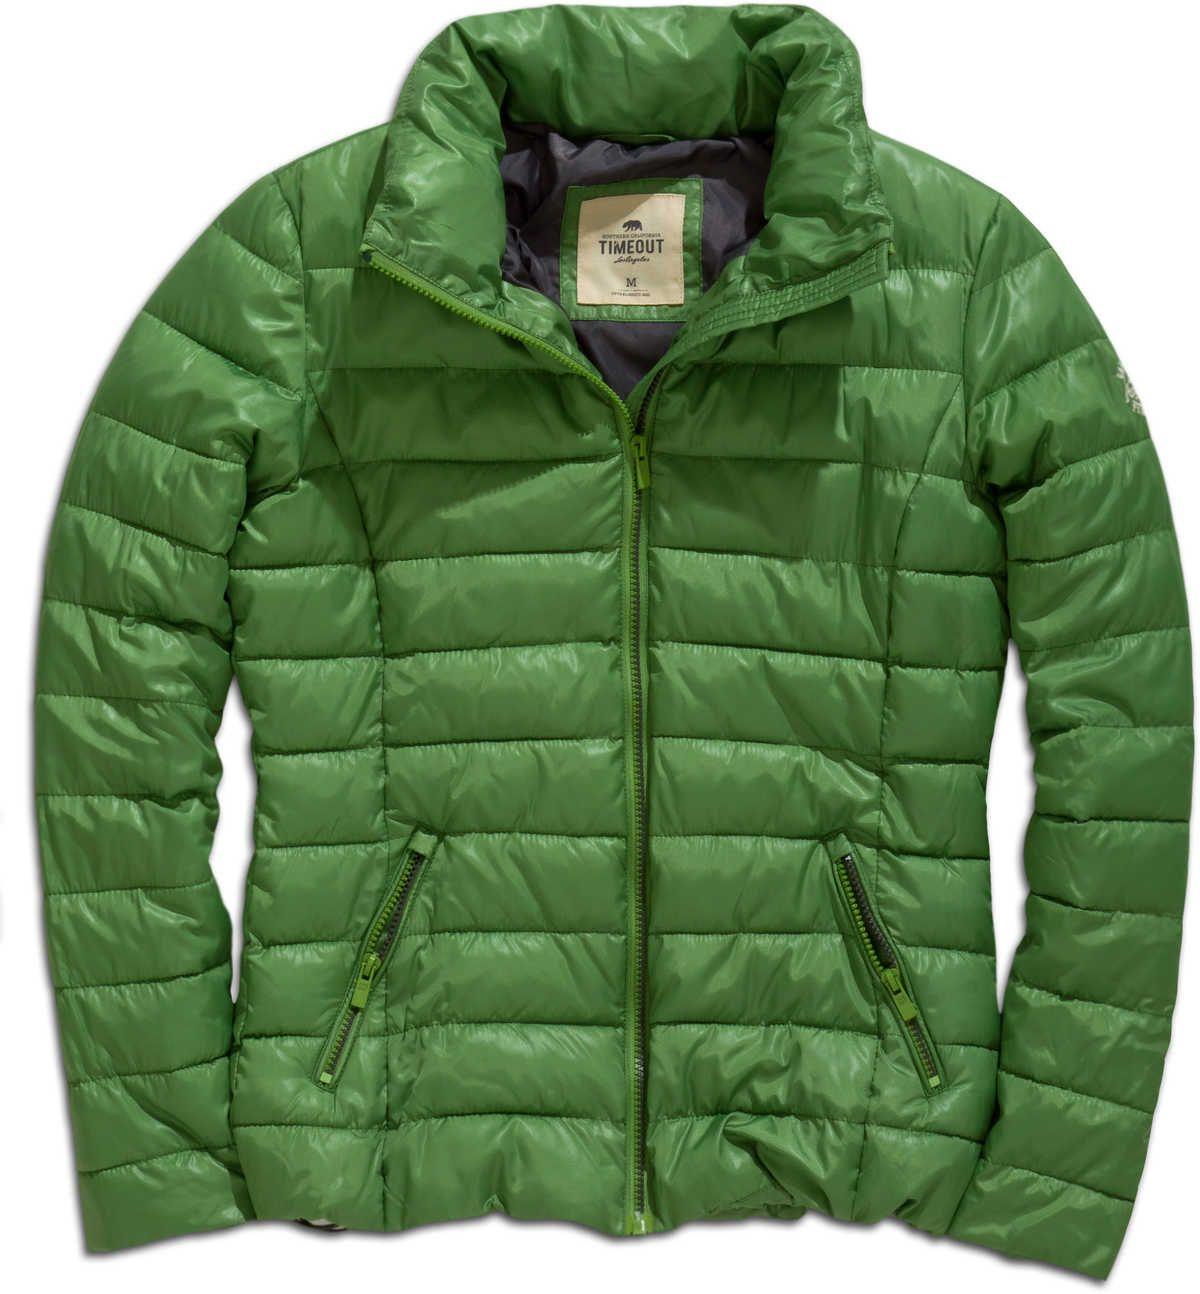 Timeout E Shop Bundy 144081274pe19 3 Green Puffer Jacket Puffer Jackets Jackets [ 1294 x 1200 Pixel ]